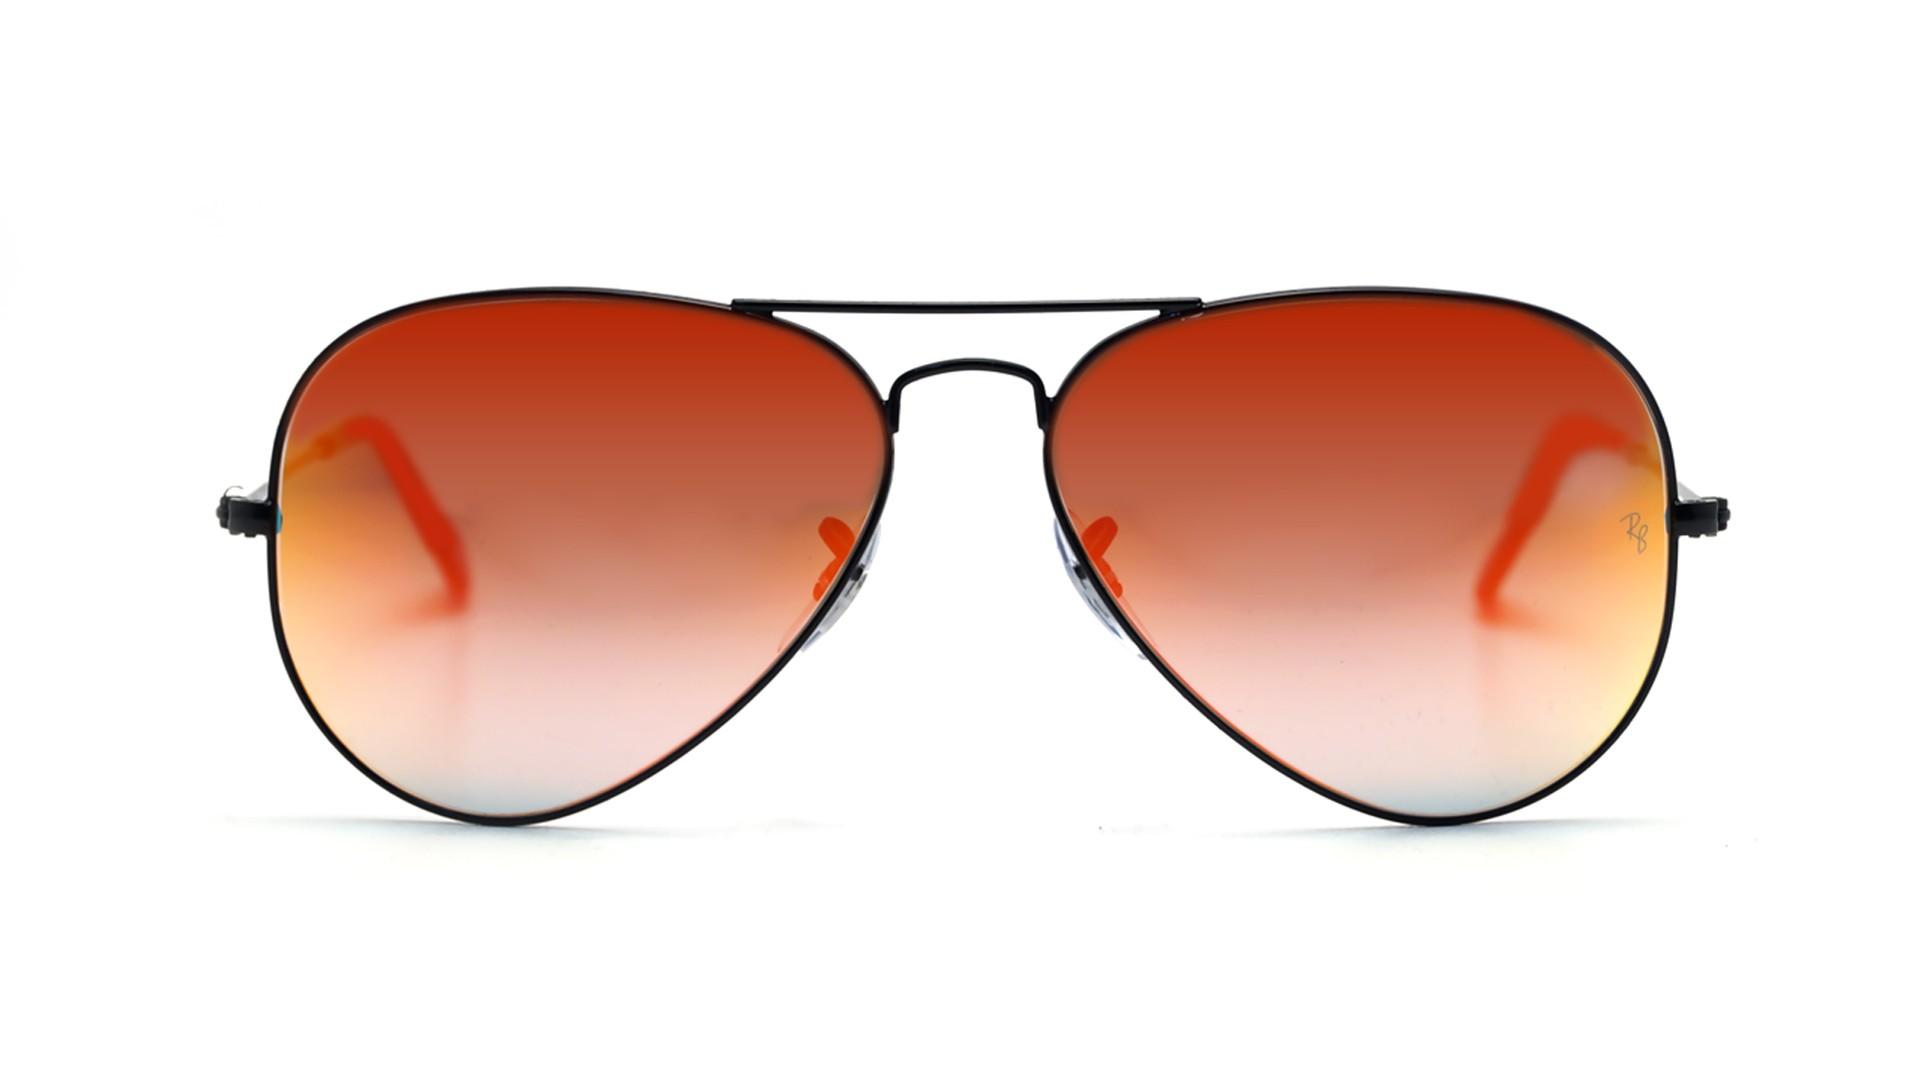 60aff91c1b5 Ray Ban Aviator Rb3025 Black Mirror Sunglasses « Heritage Malta